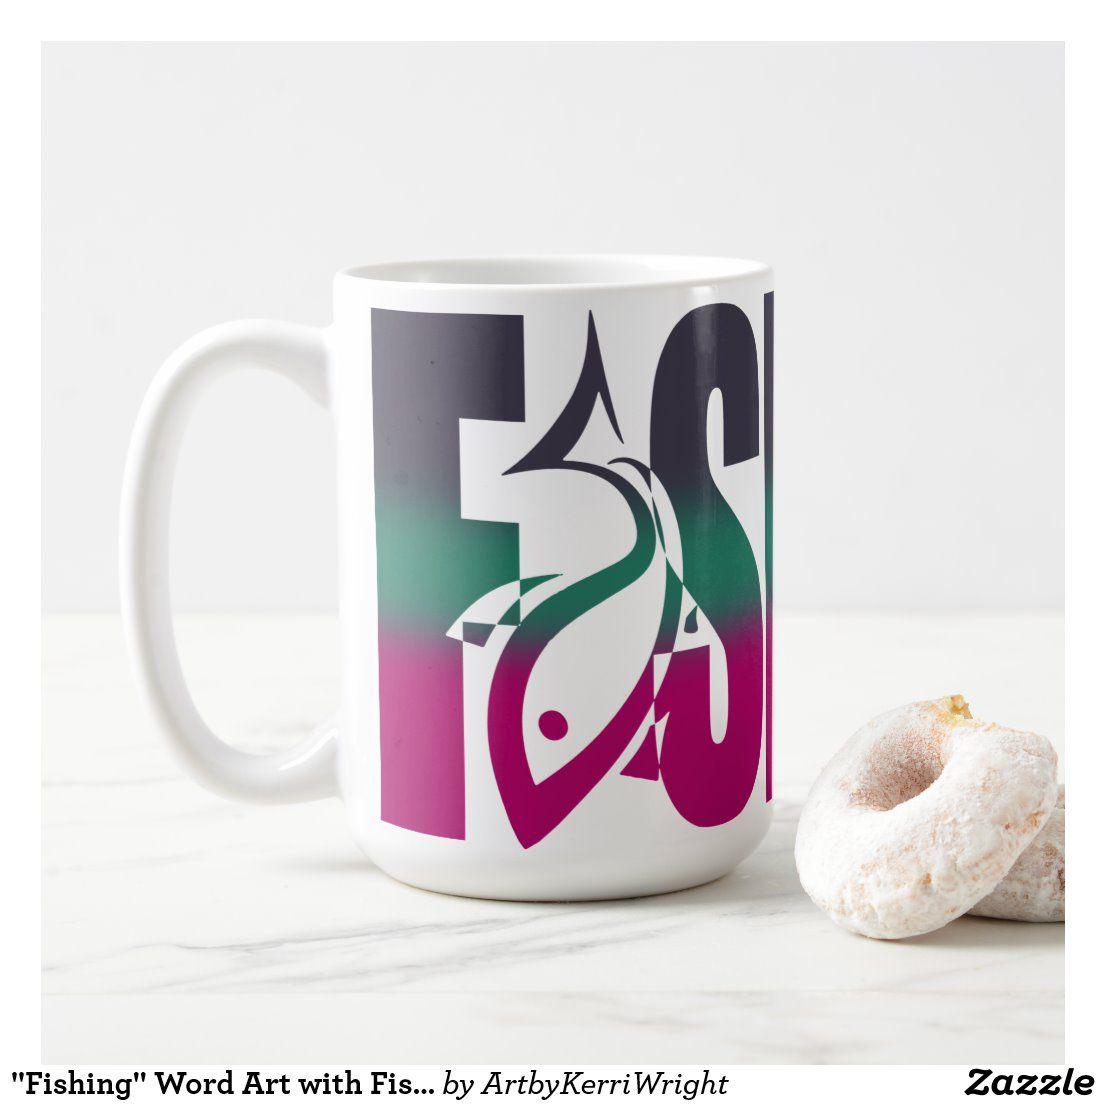 Fishing Word Art With Fish Outline Coffee Mug Zazzle Com In 2020 Fish Outline Word Art Mugs